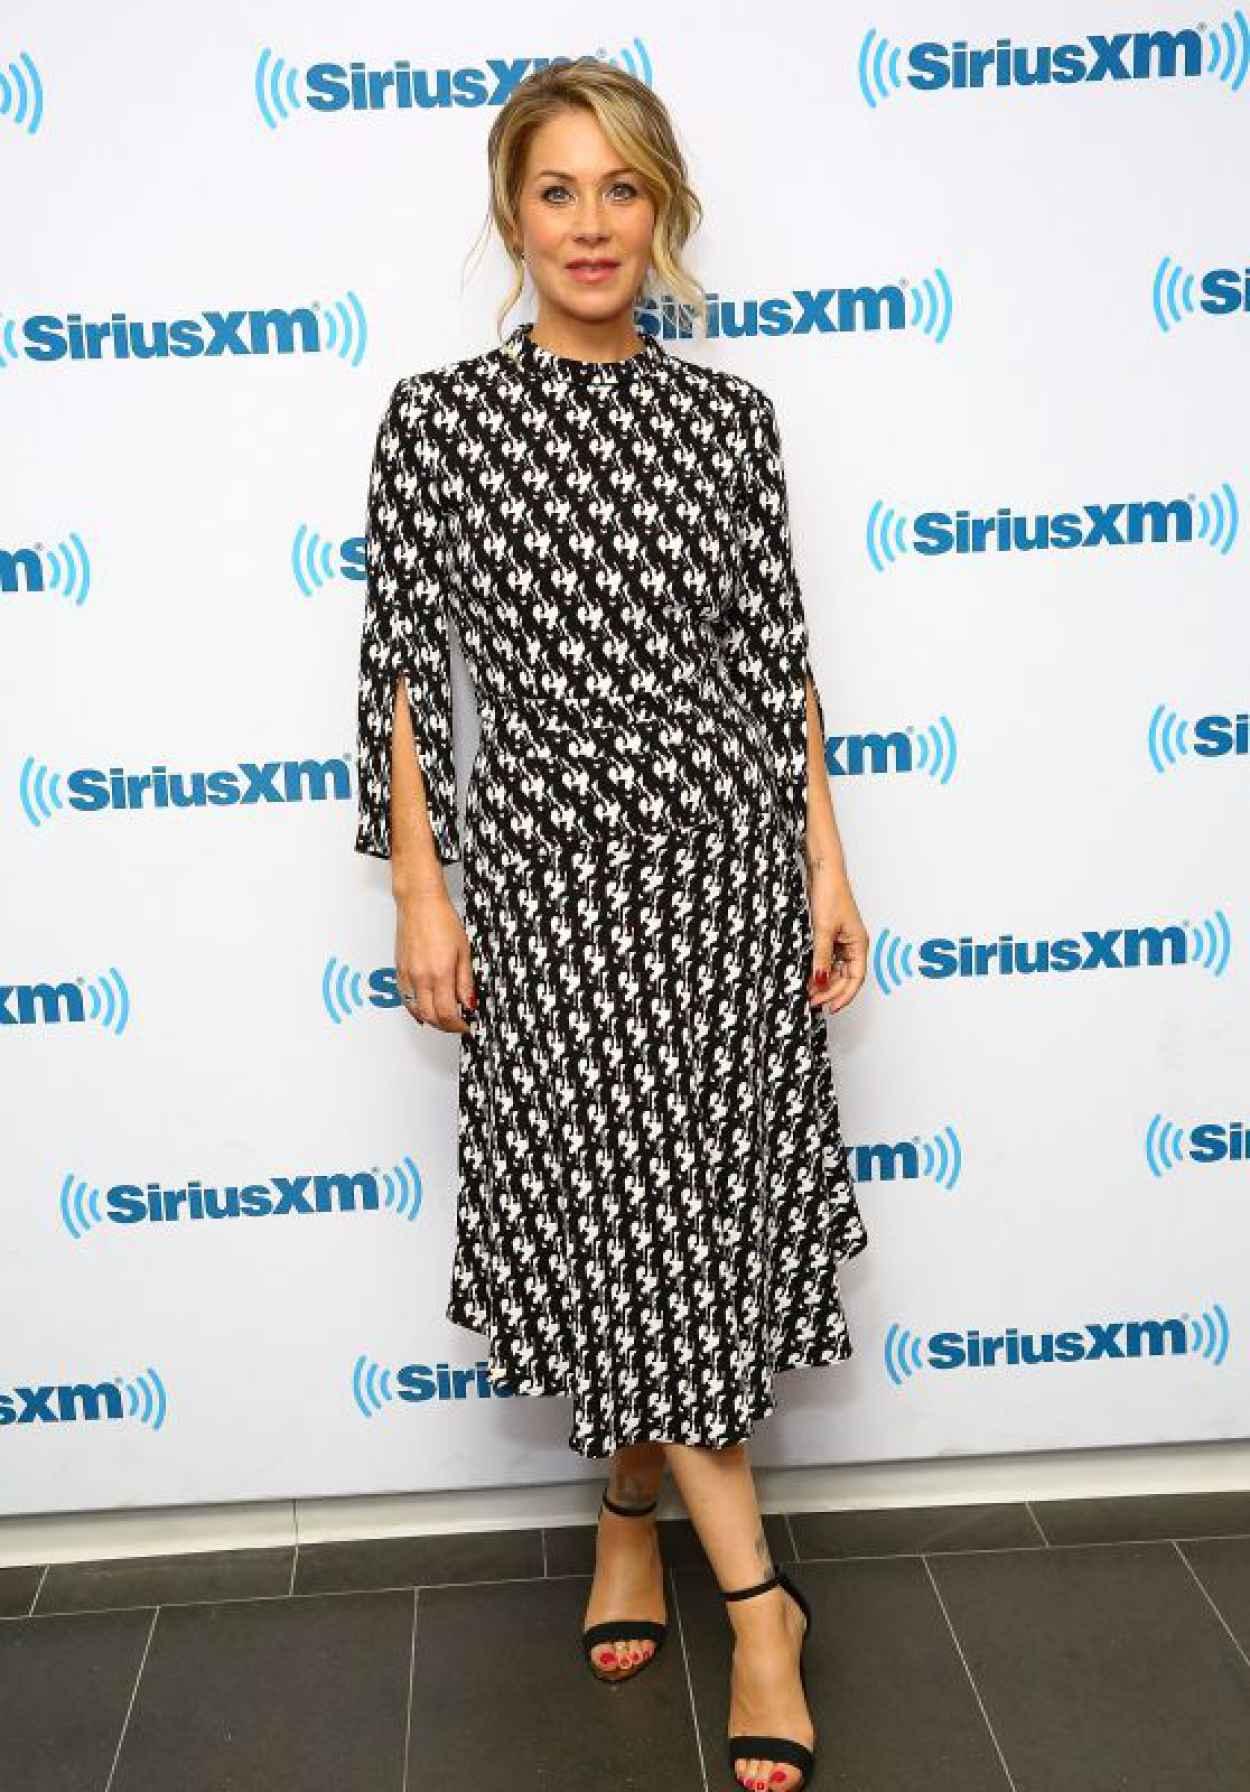 Christina Applegate at SiriusXM Studios in NYC, July 2015-1